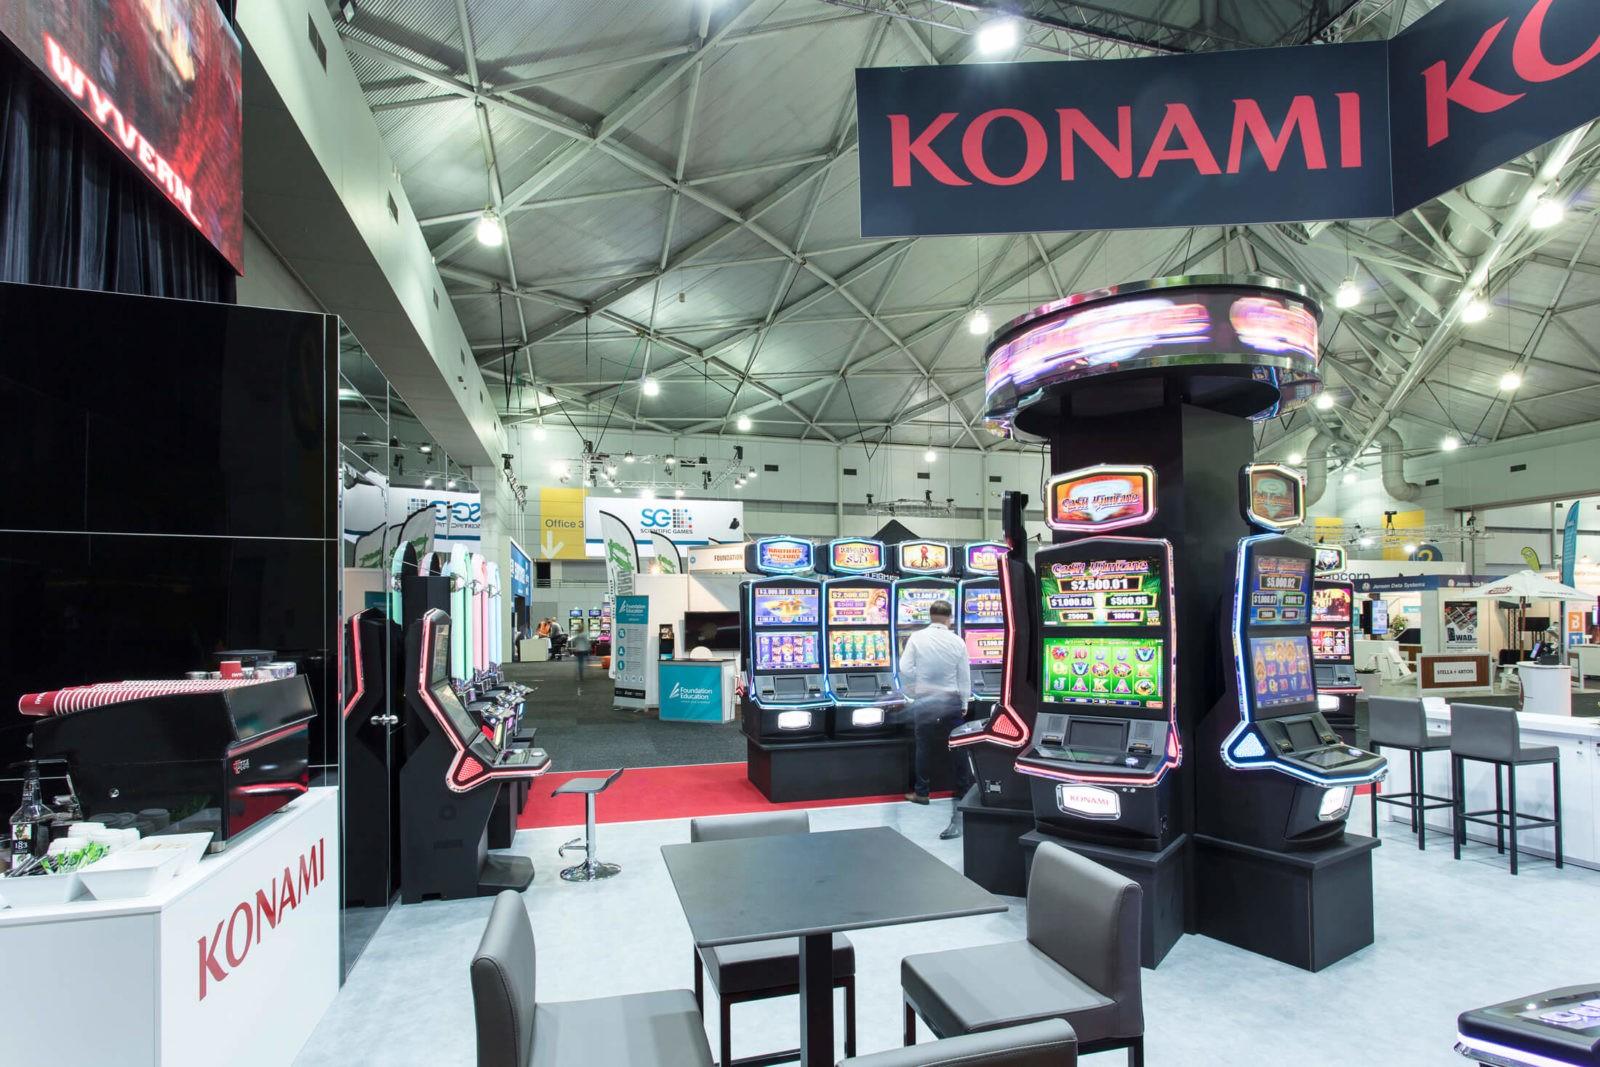 Konami2017_highres-8